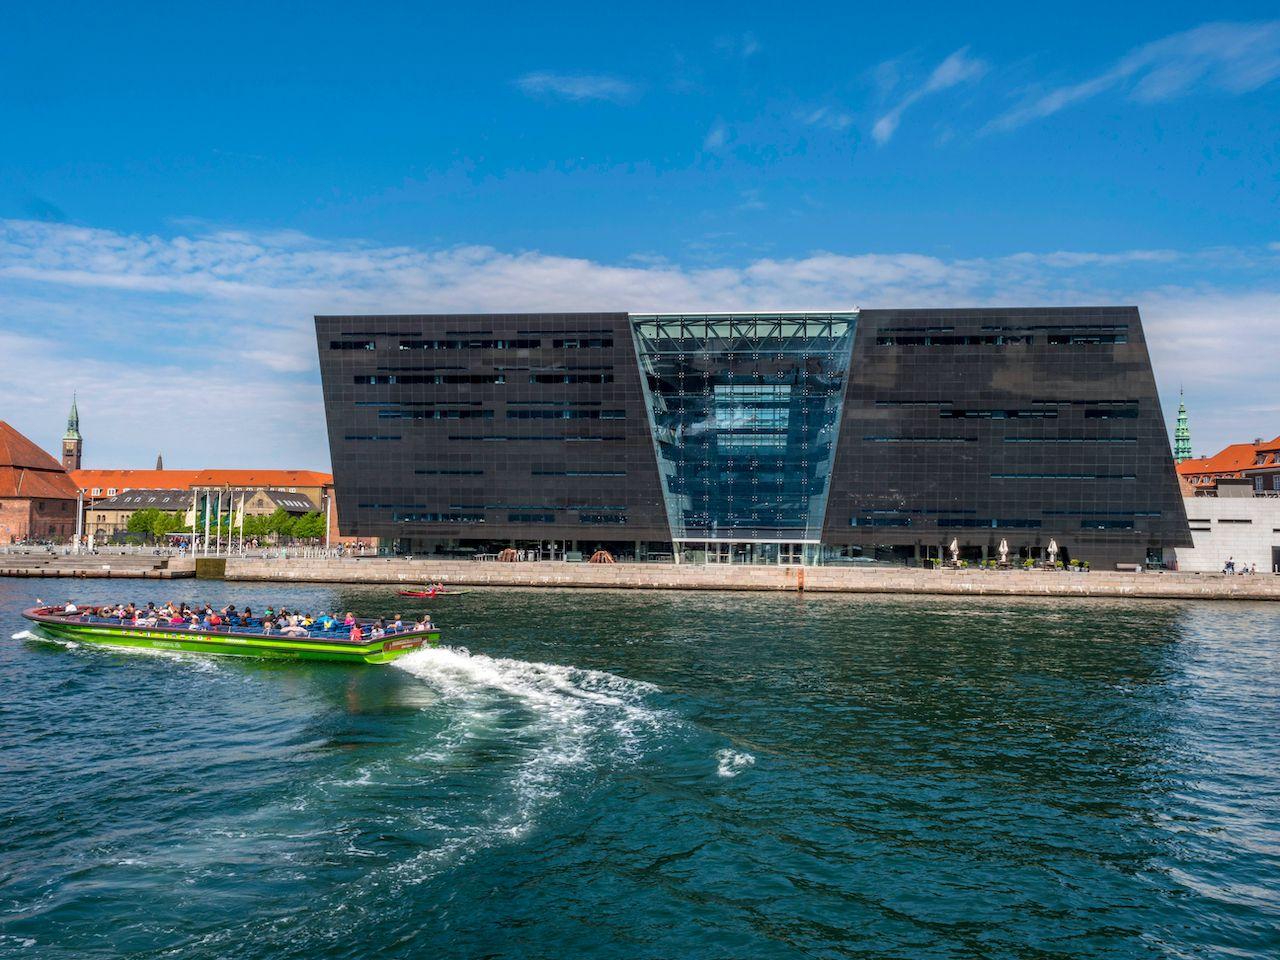 The Black Diamond, modern addition to the Royal Danish Library Copenhagen, Denmark, Scandinavia, Europe, 22. May 2016, Denmark architecture